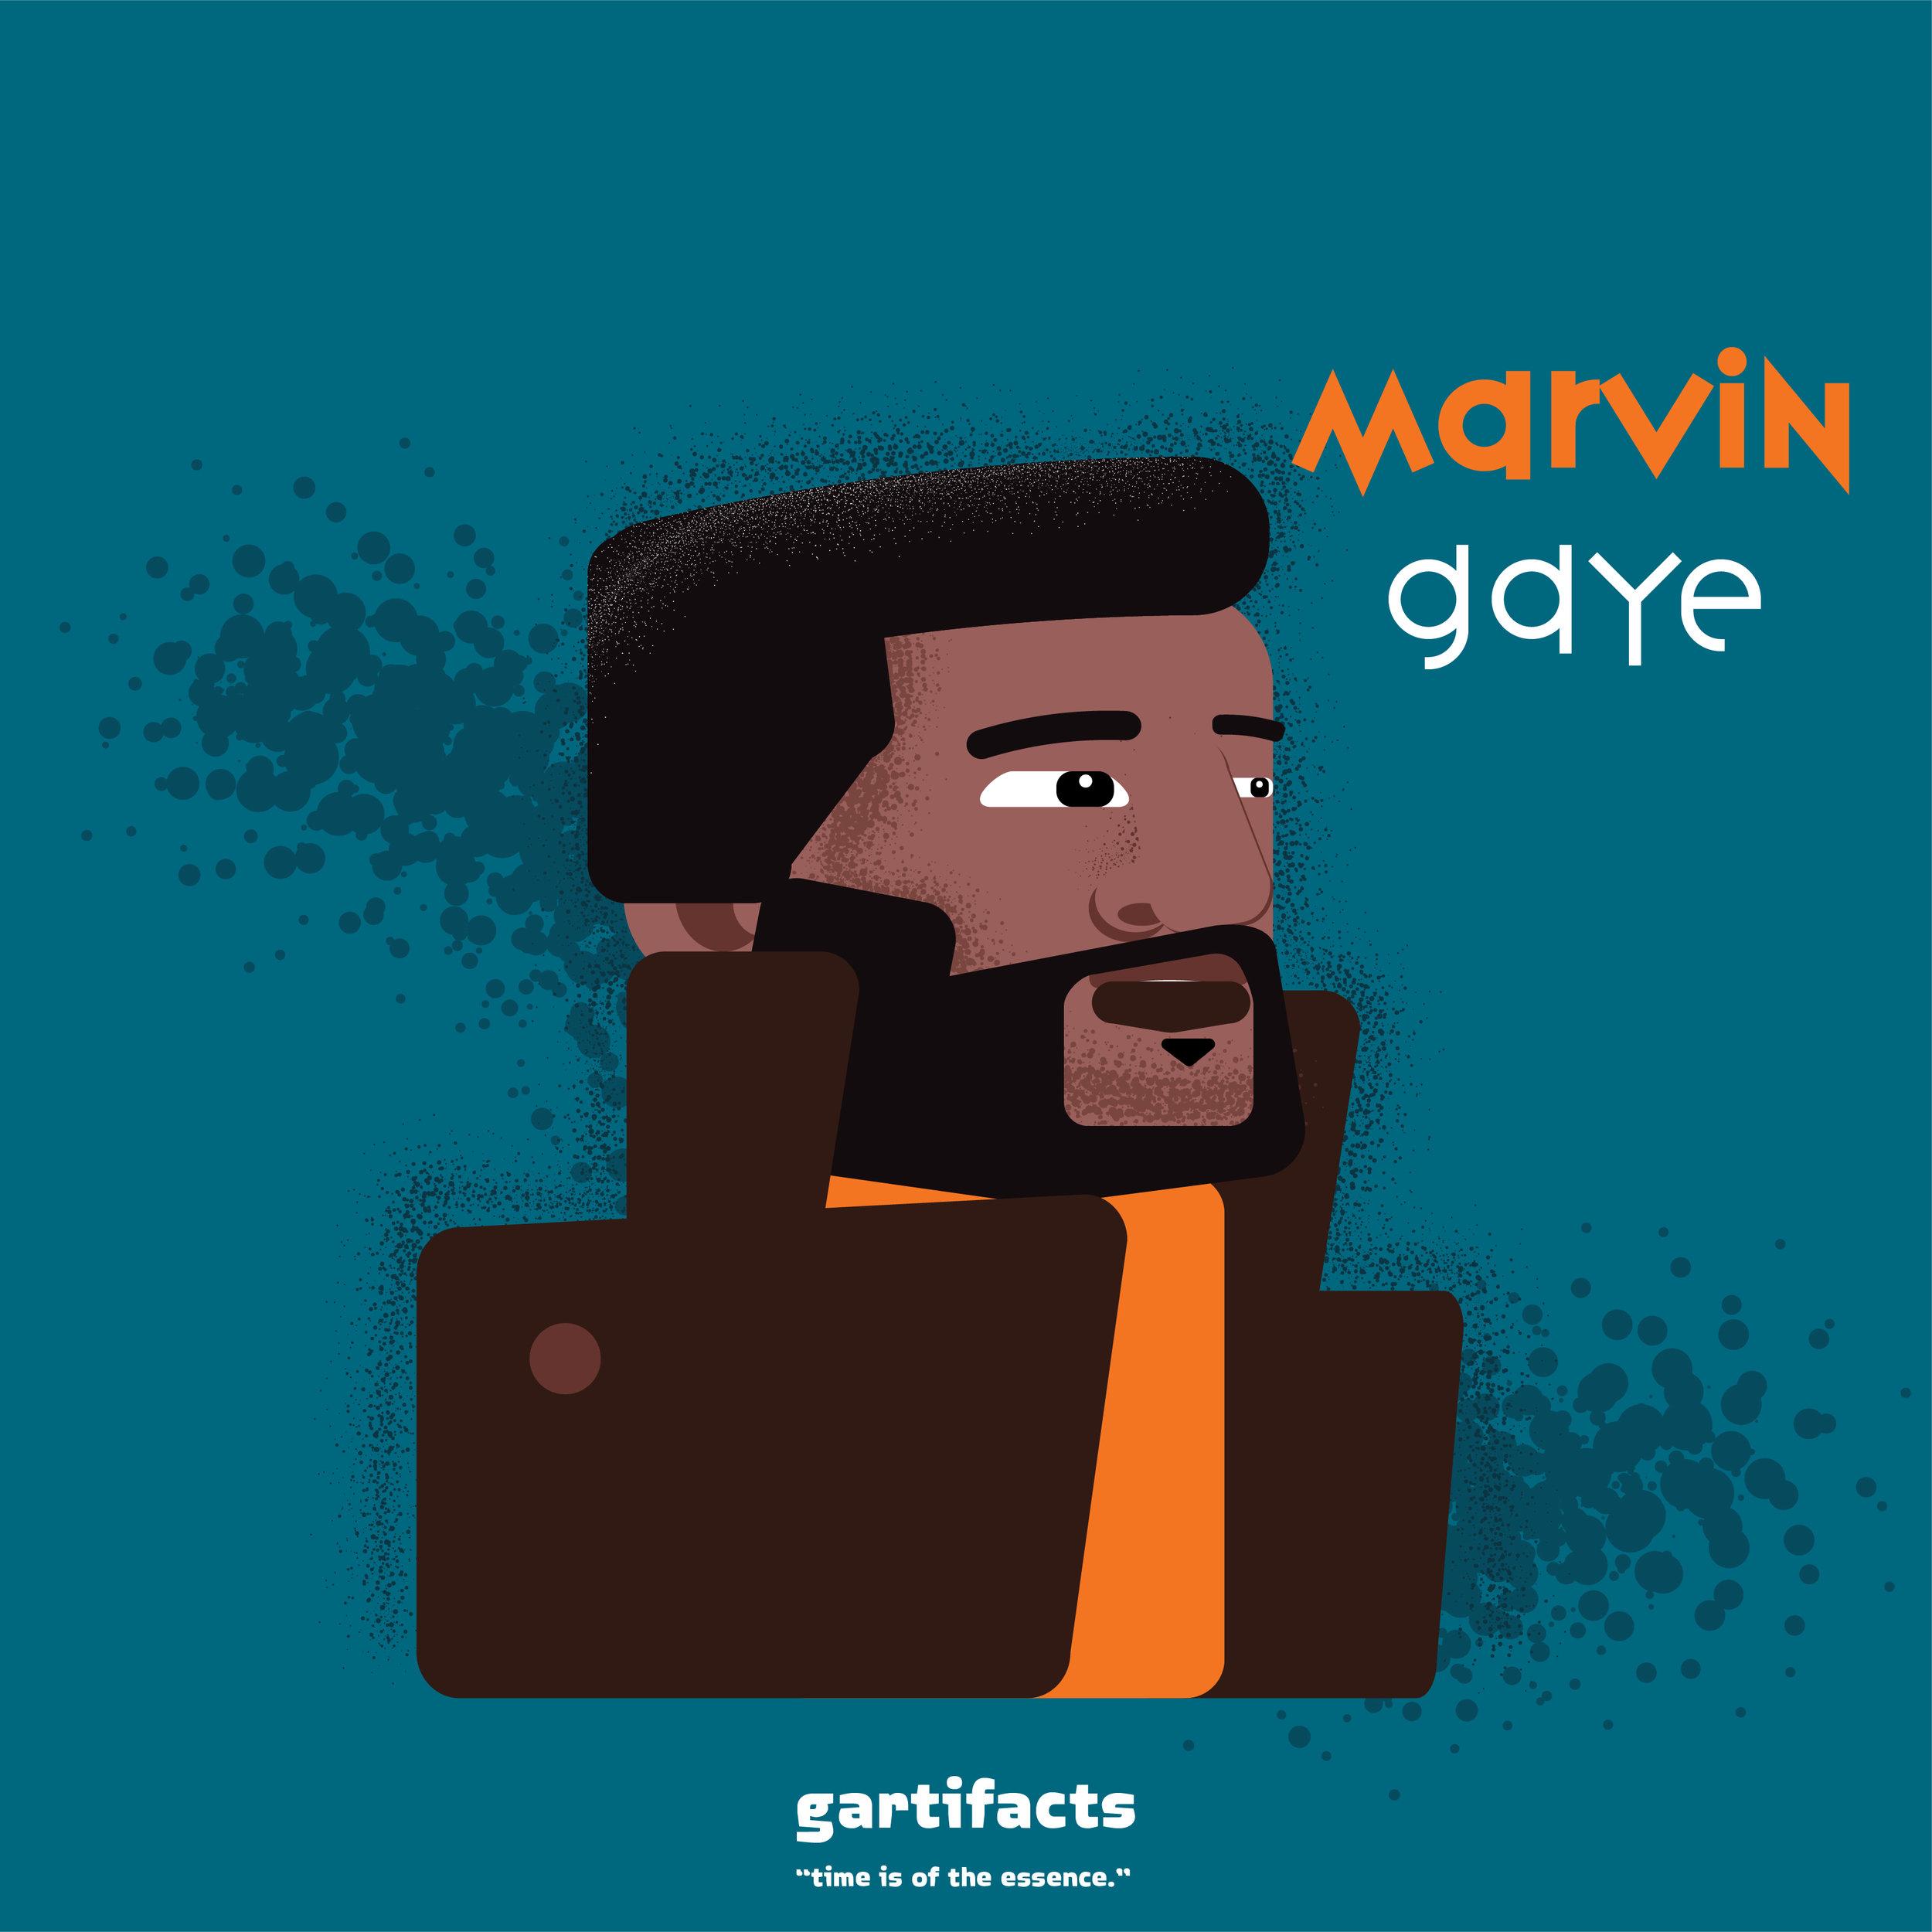 Digital Artwork: Ode to Marvin Copyright Gartifacts 2018